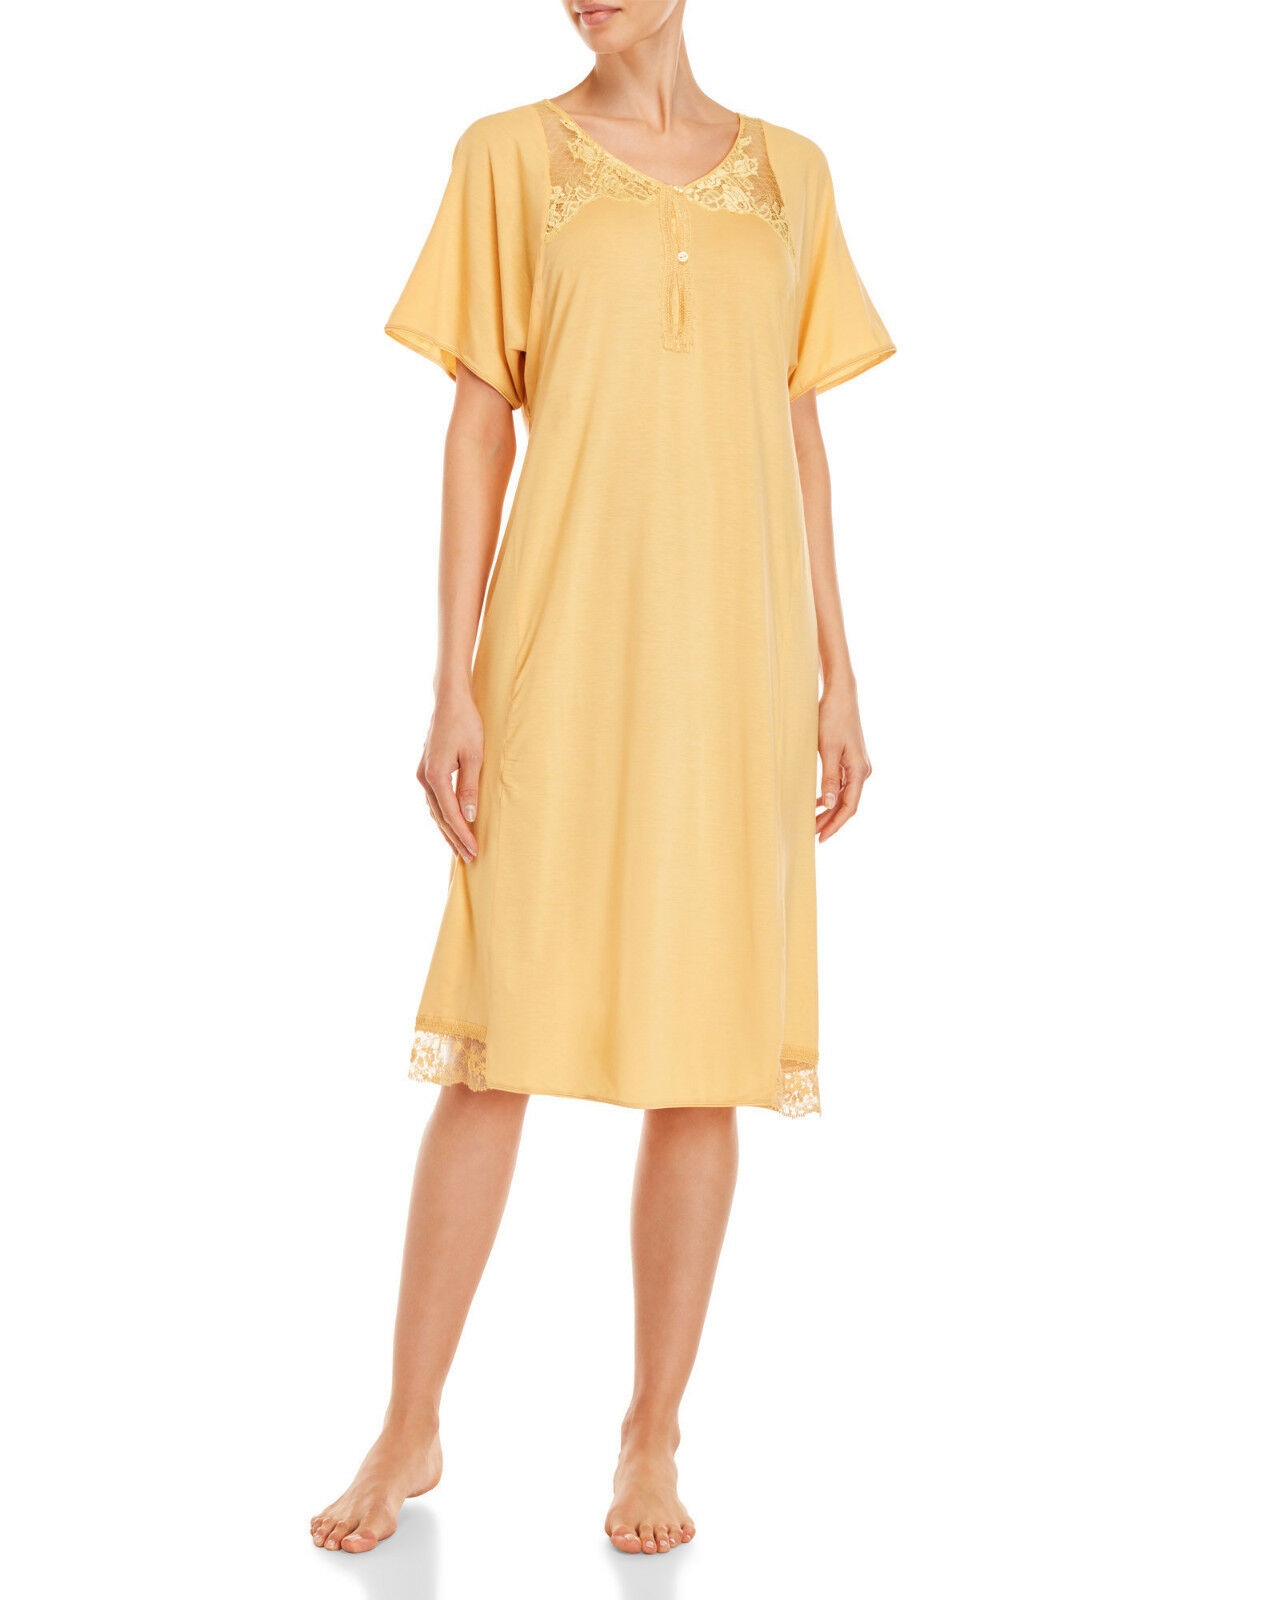 La Perla Villa Toscana L Nightgown Yellow Lace Trim Short Sleeves New